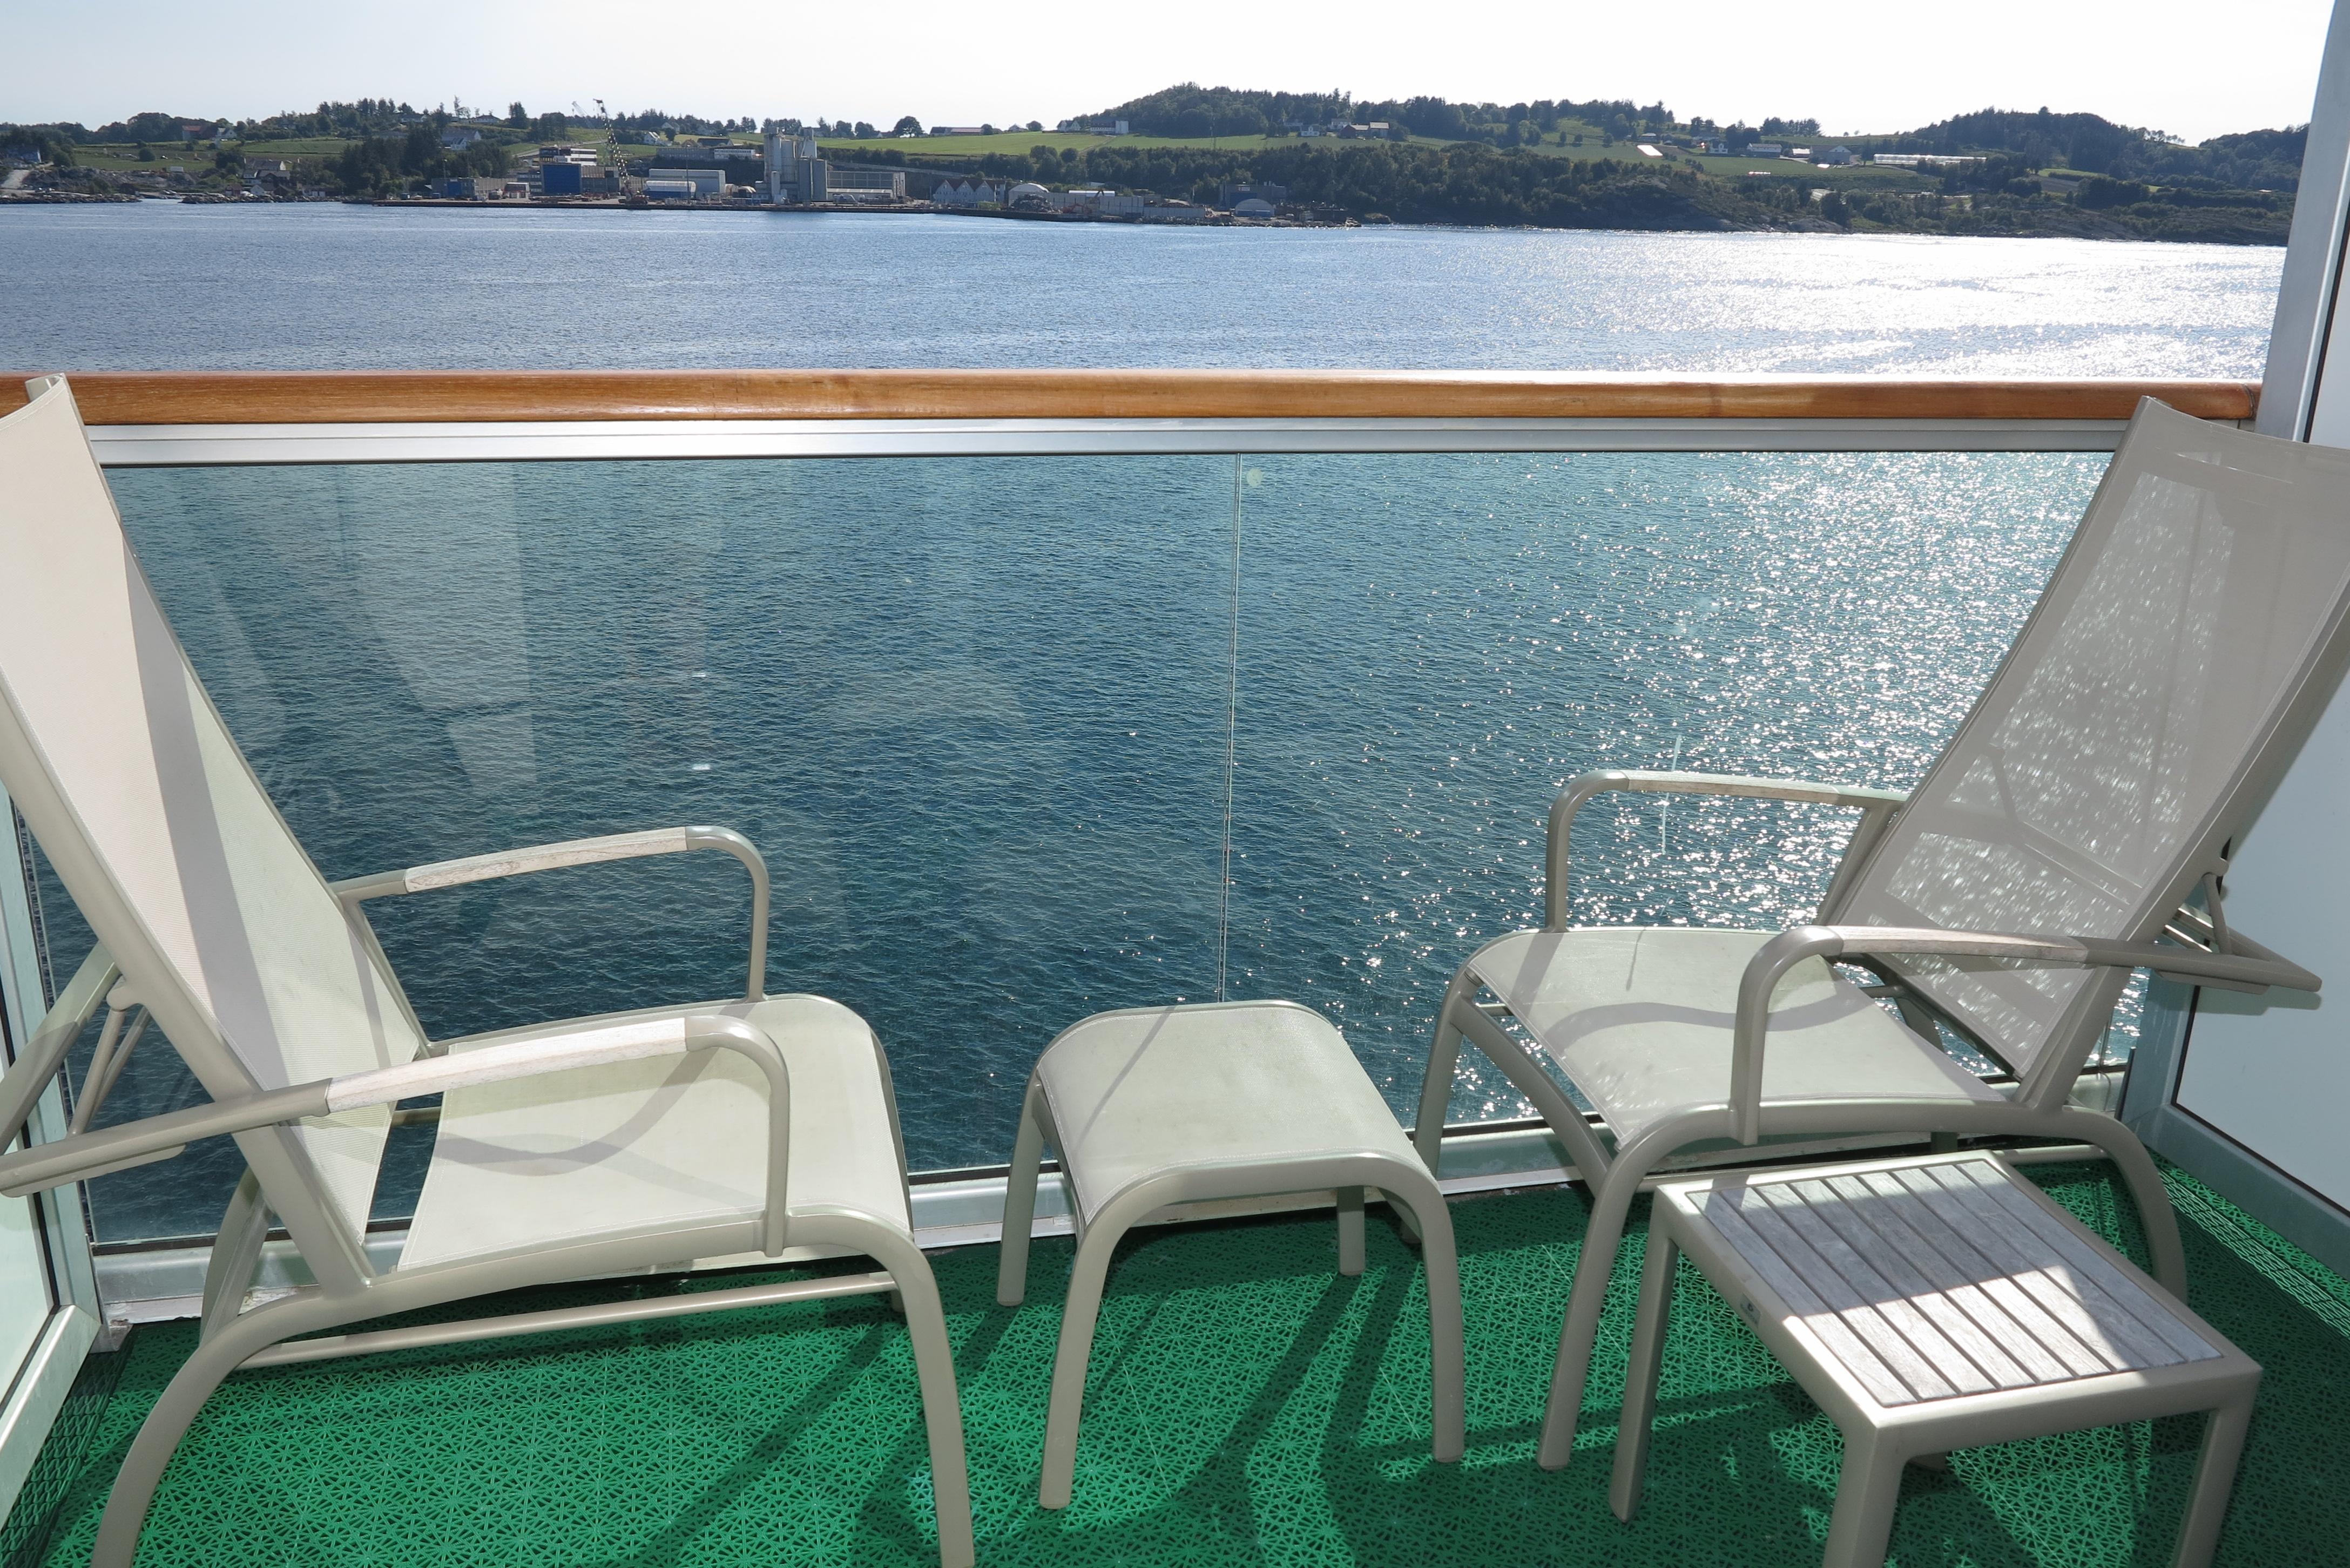 Sun spot: Having a balcony is a great advantage in good weather